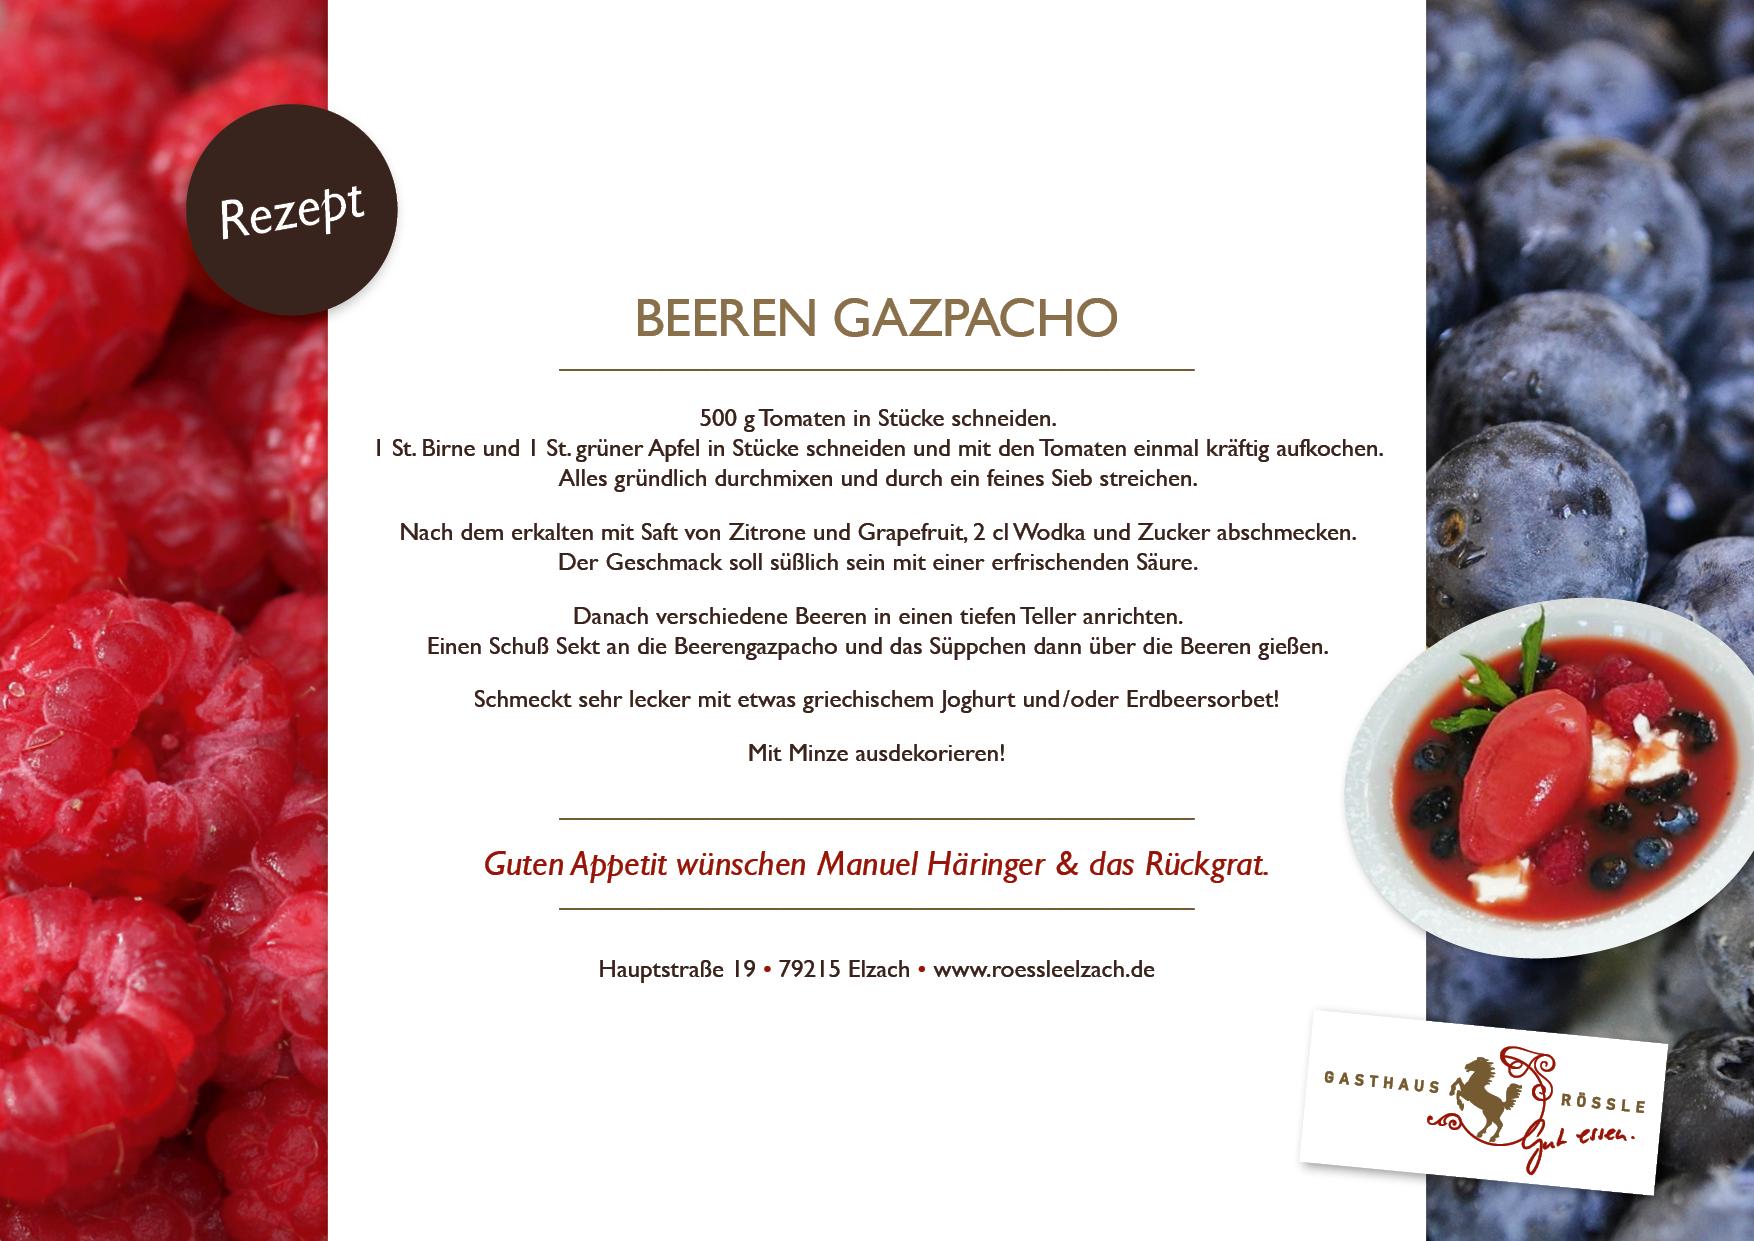 2015_07_29_Beeren-Gazpacho_Newsletter_August2015